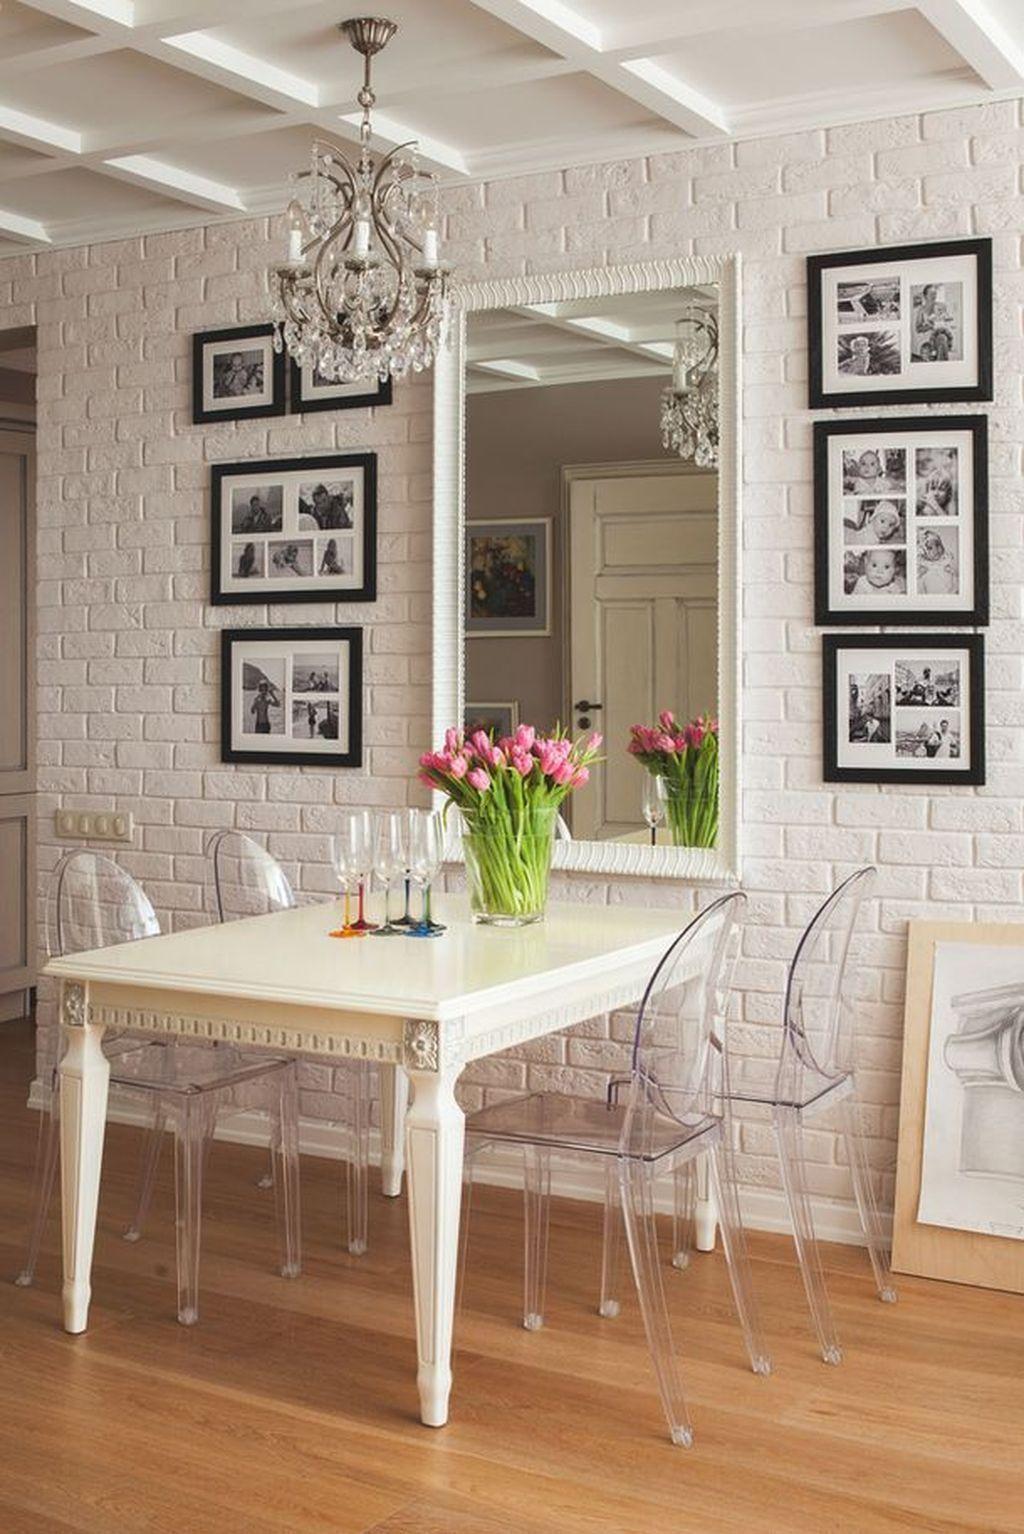 Cool 36 Stunning Small Dining Room Decoration Ideas